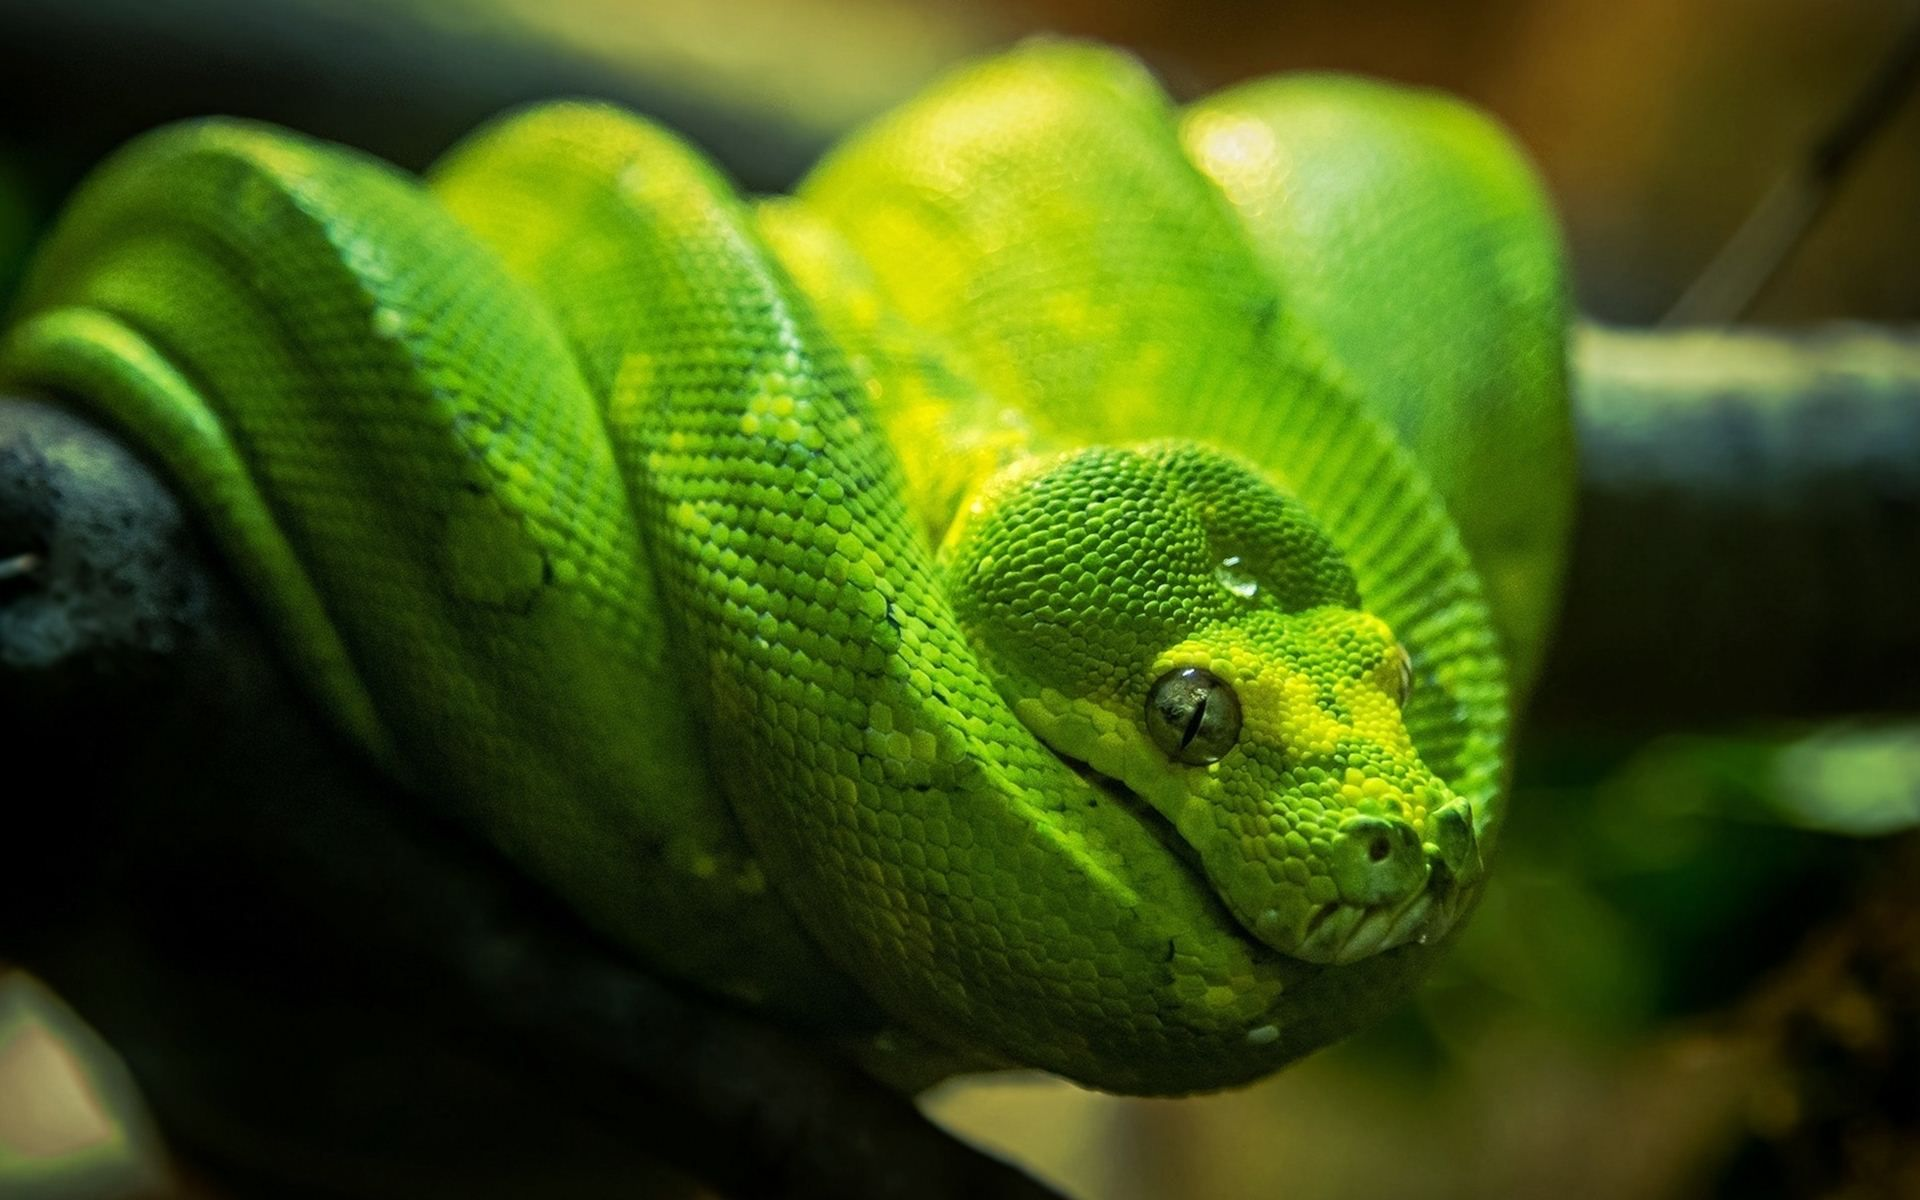 The Green tree python (Morelia viridis) is an arboreal species of ...